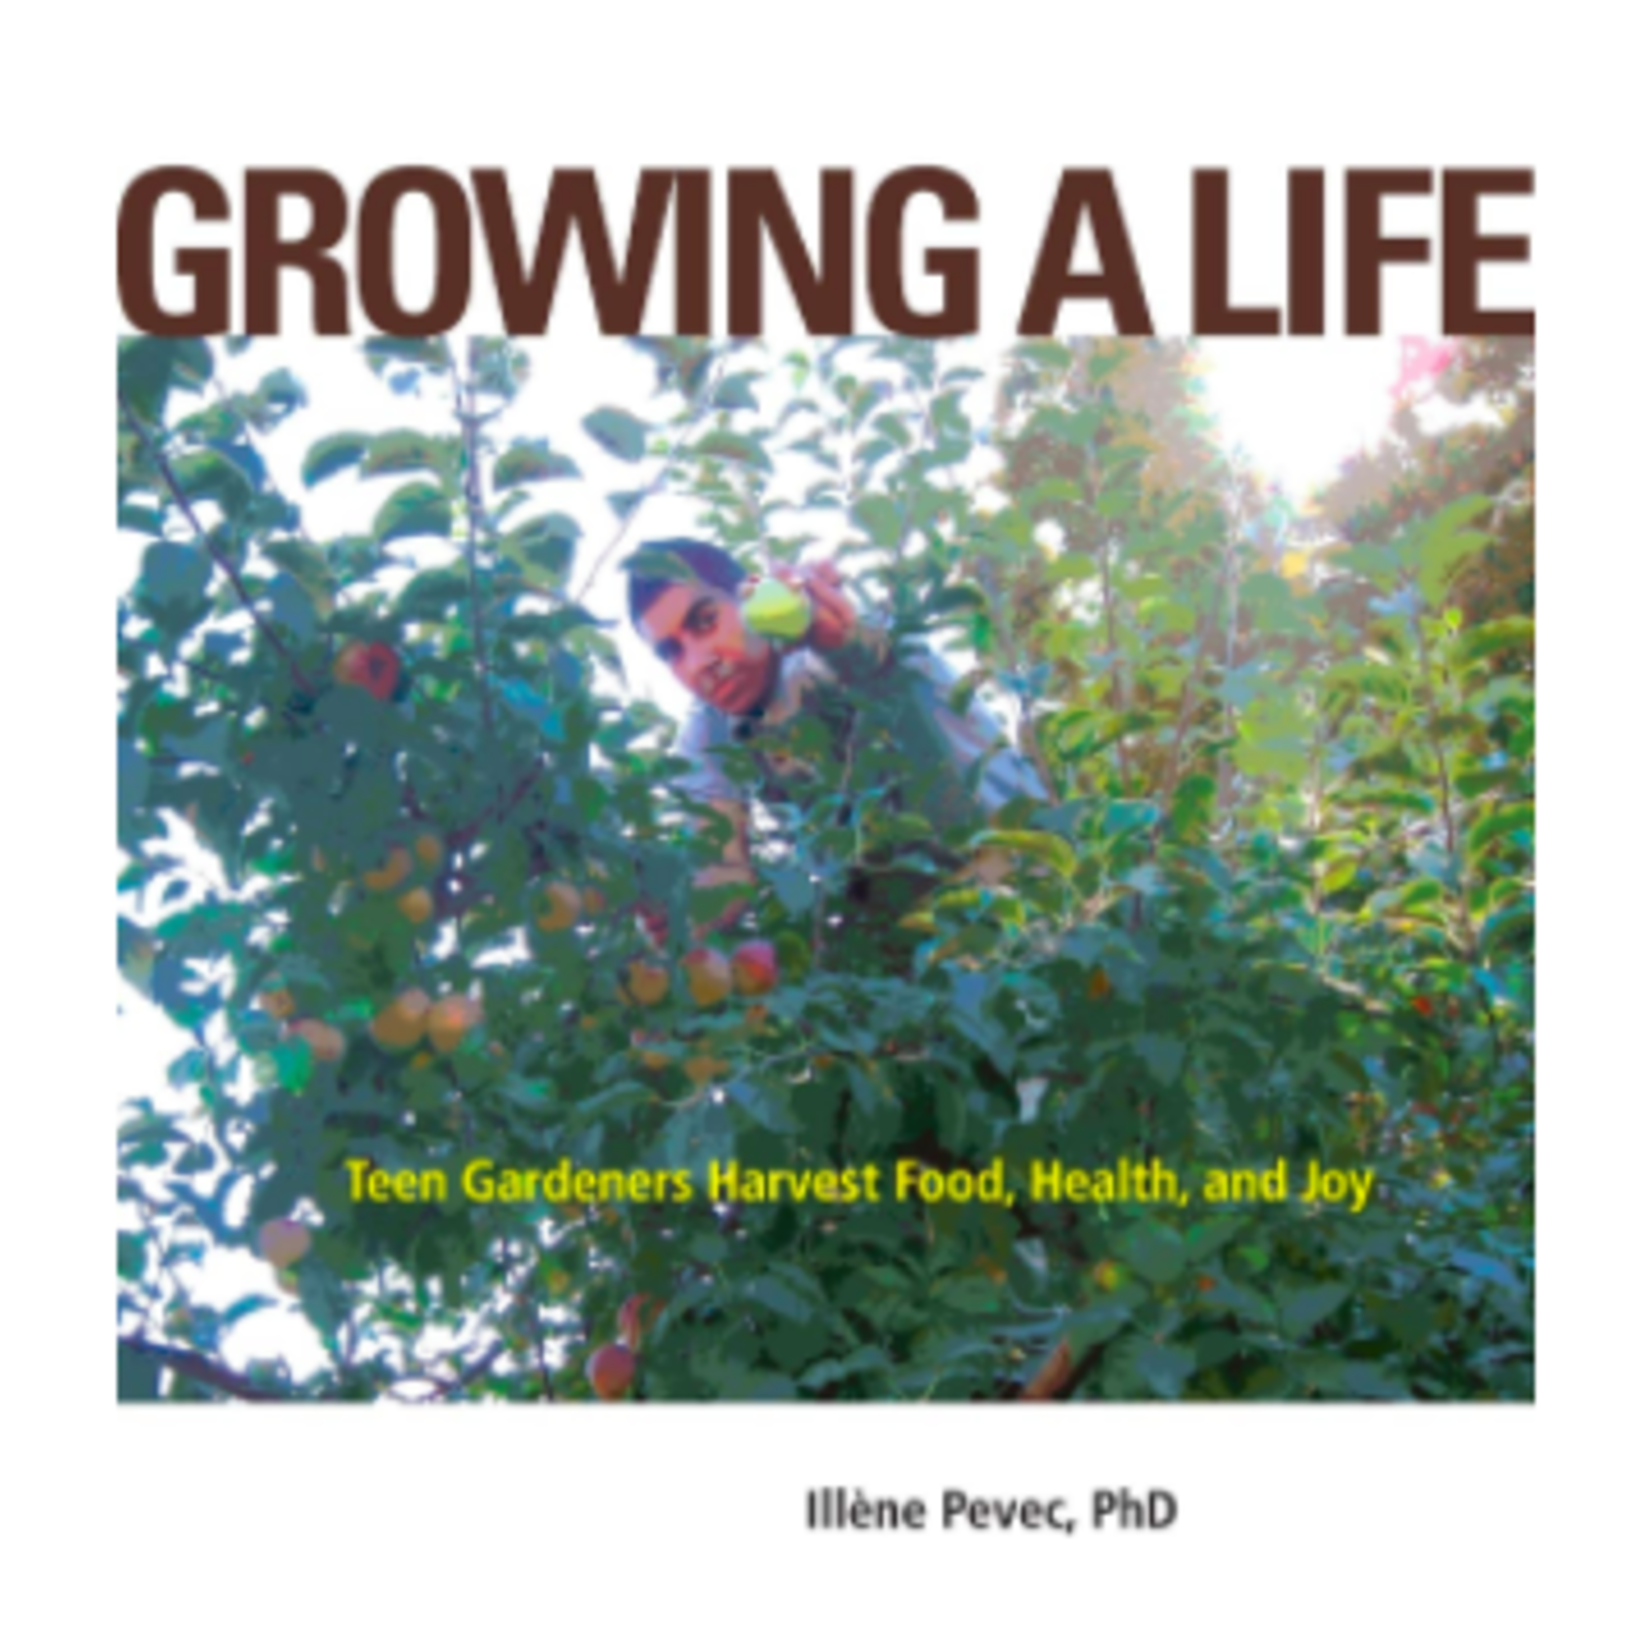 New Village Growing a Life: Teen Gardeners Harvest Food, Health, and Joy